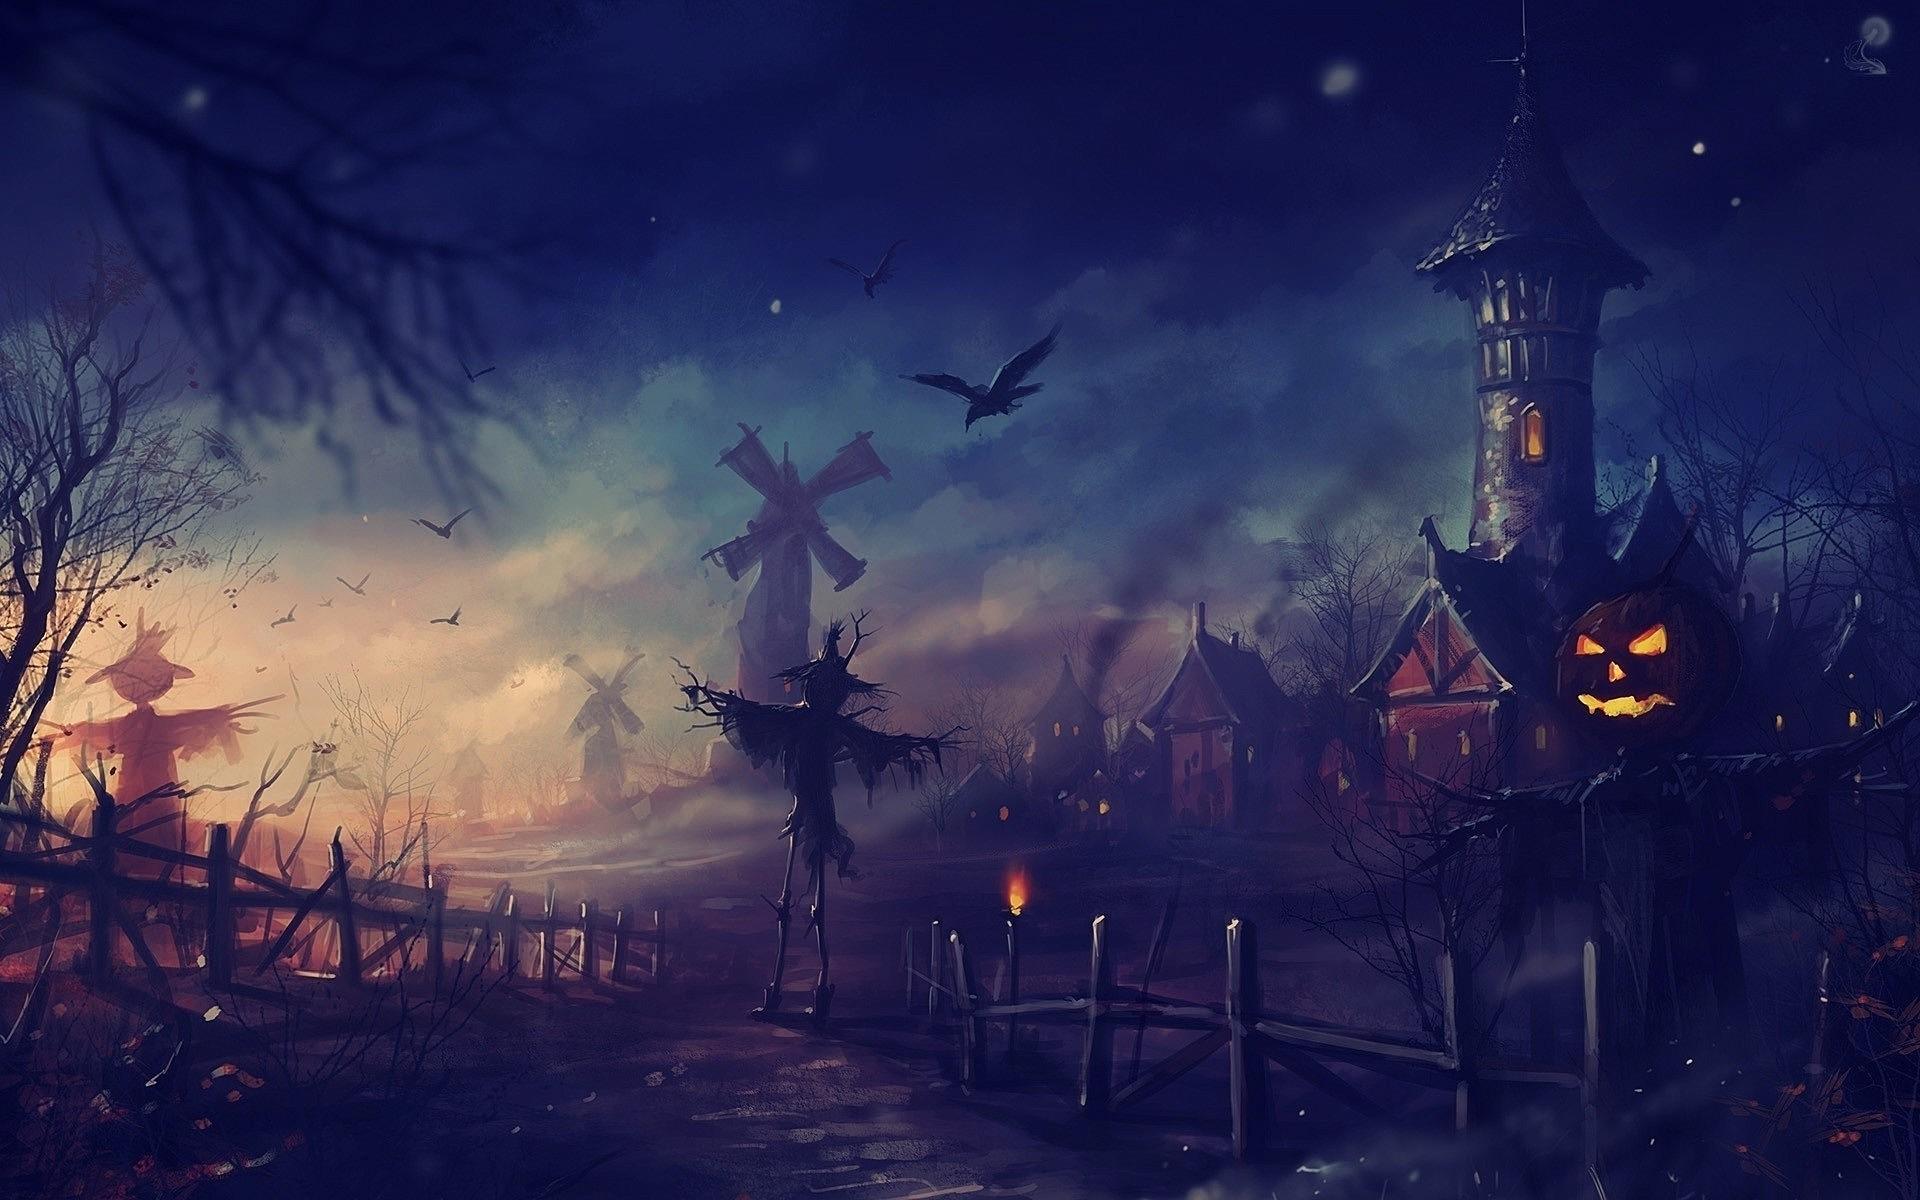 Halloween wallpaper HD desktop